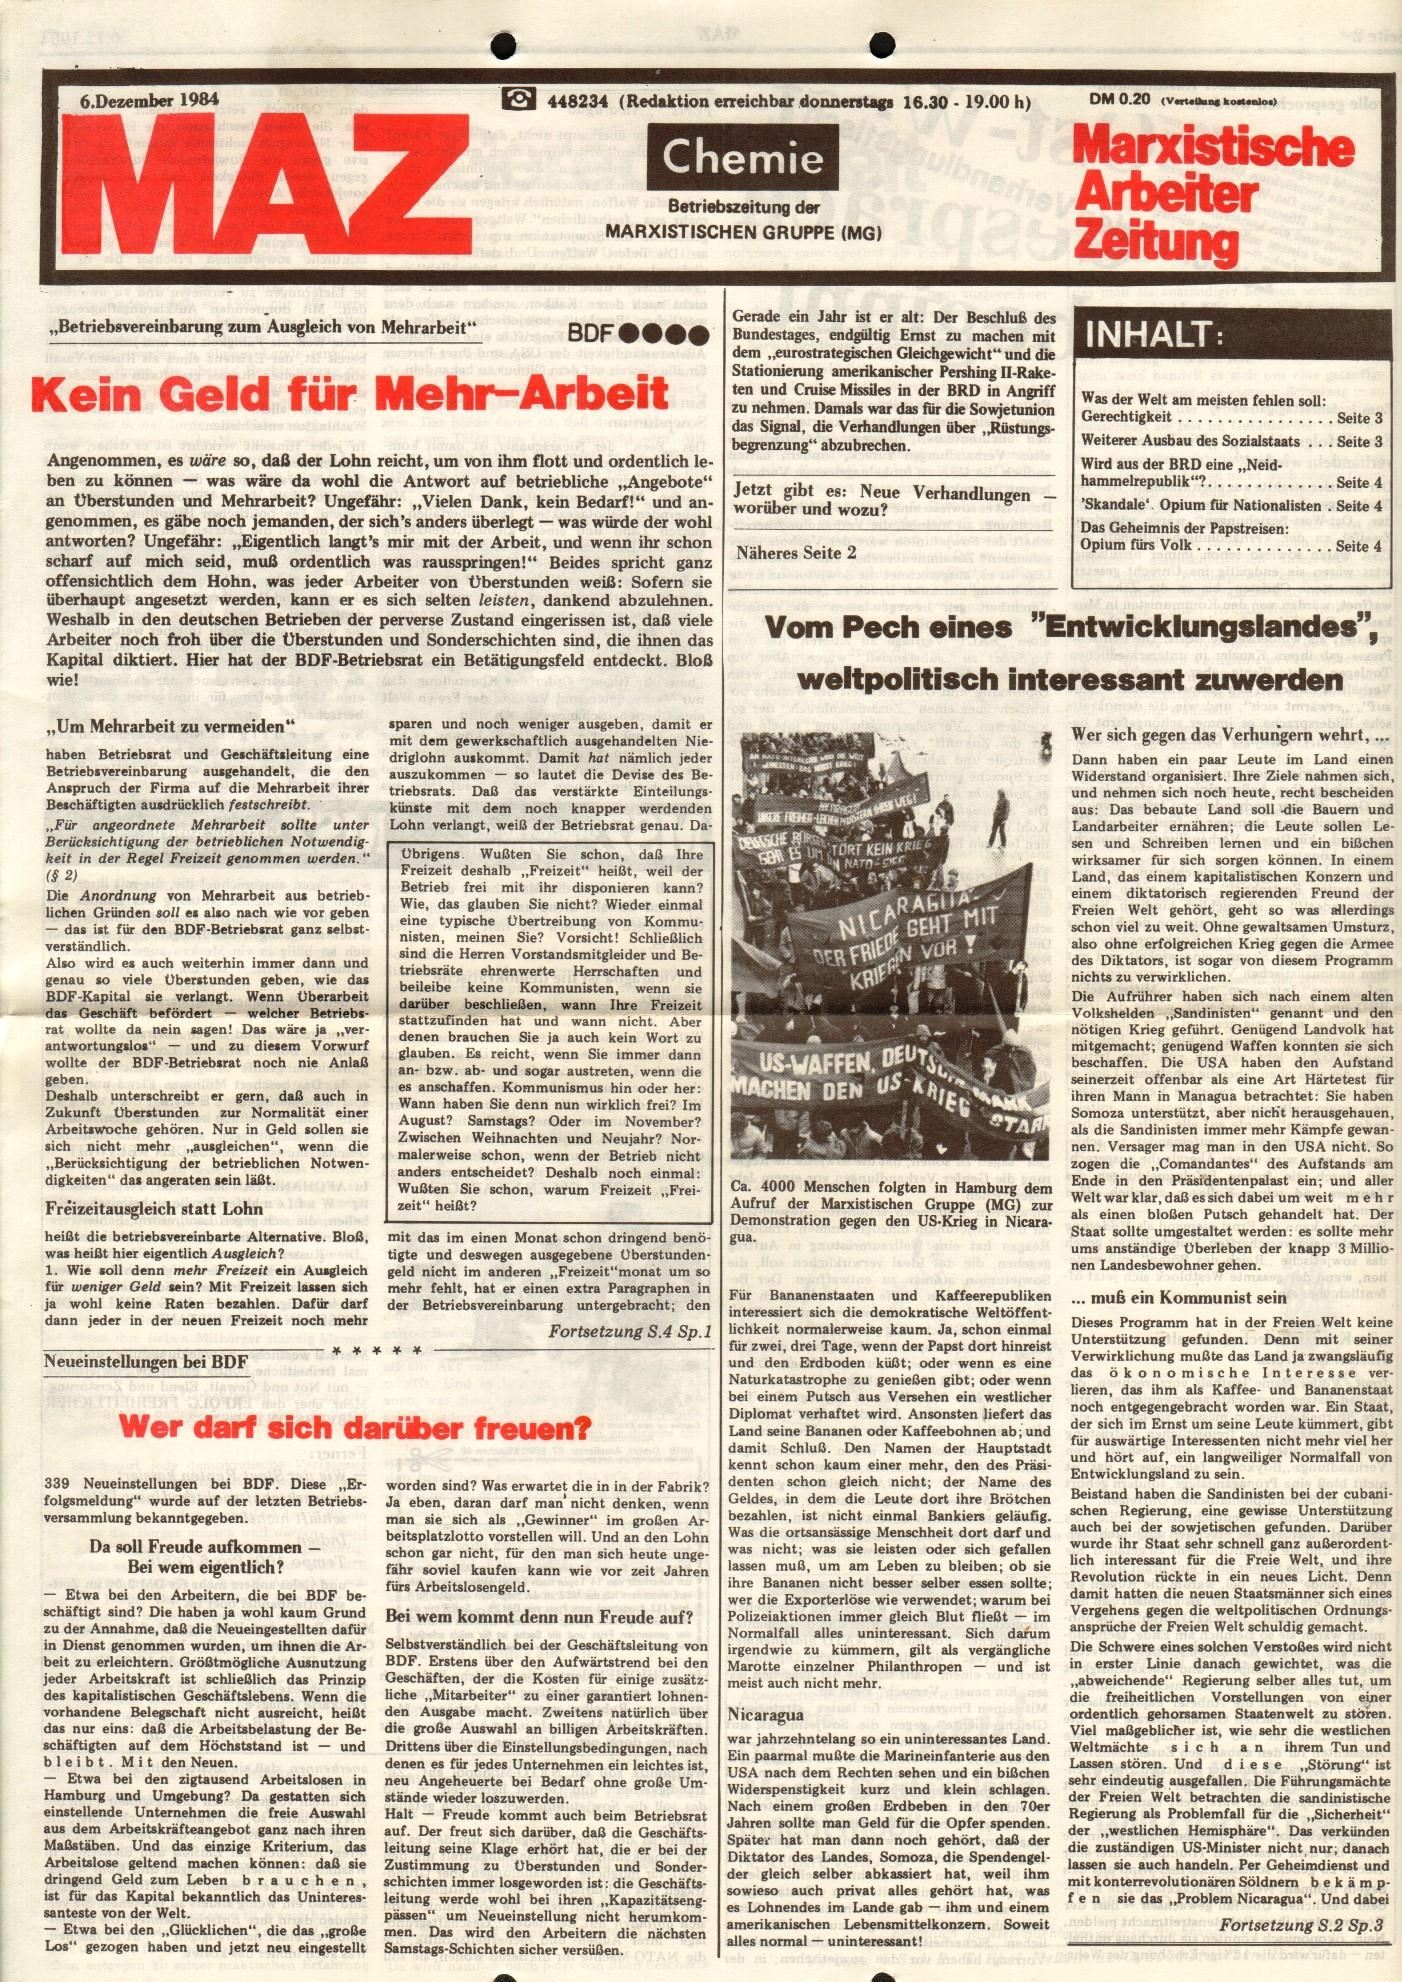 Hamburg_MG_MAZ_Chemie_19841206_01